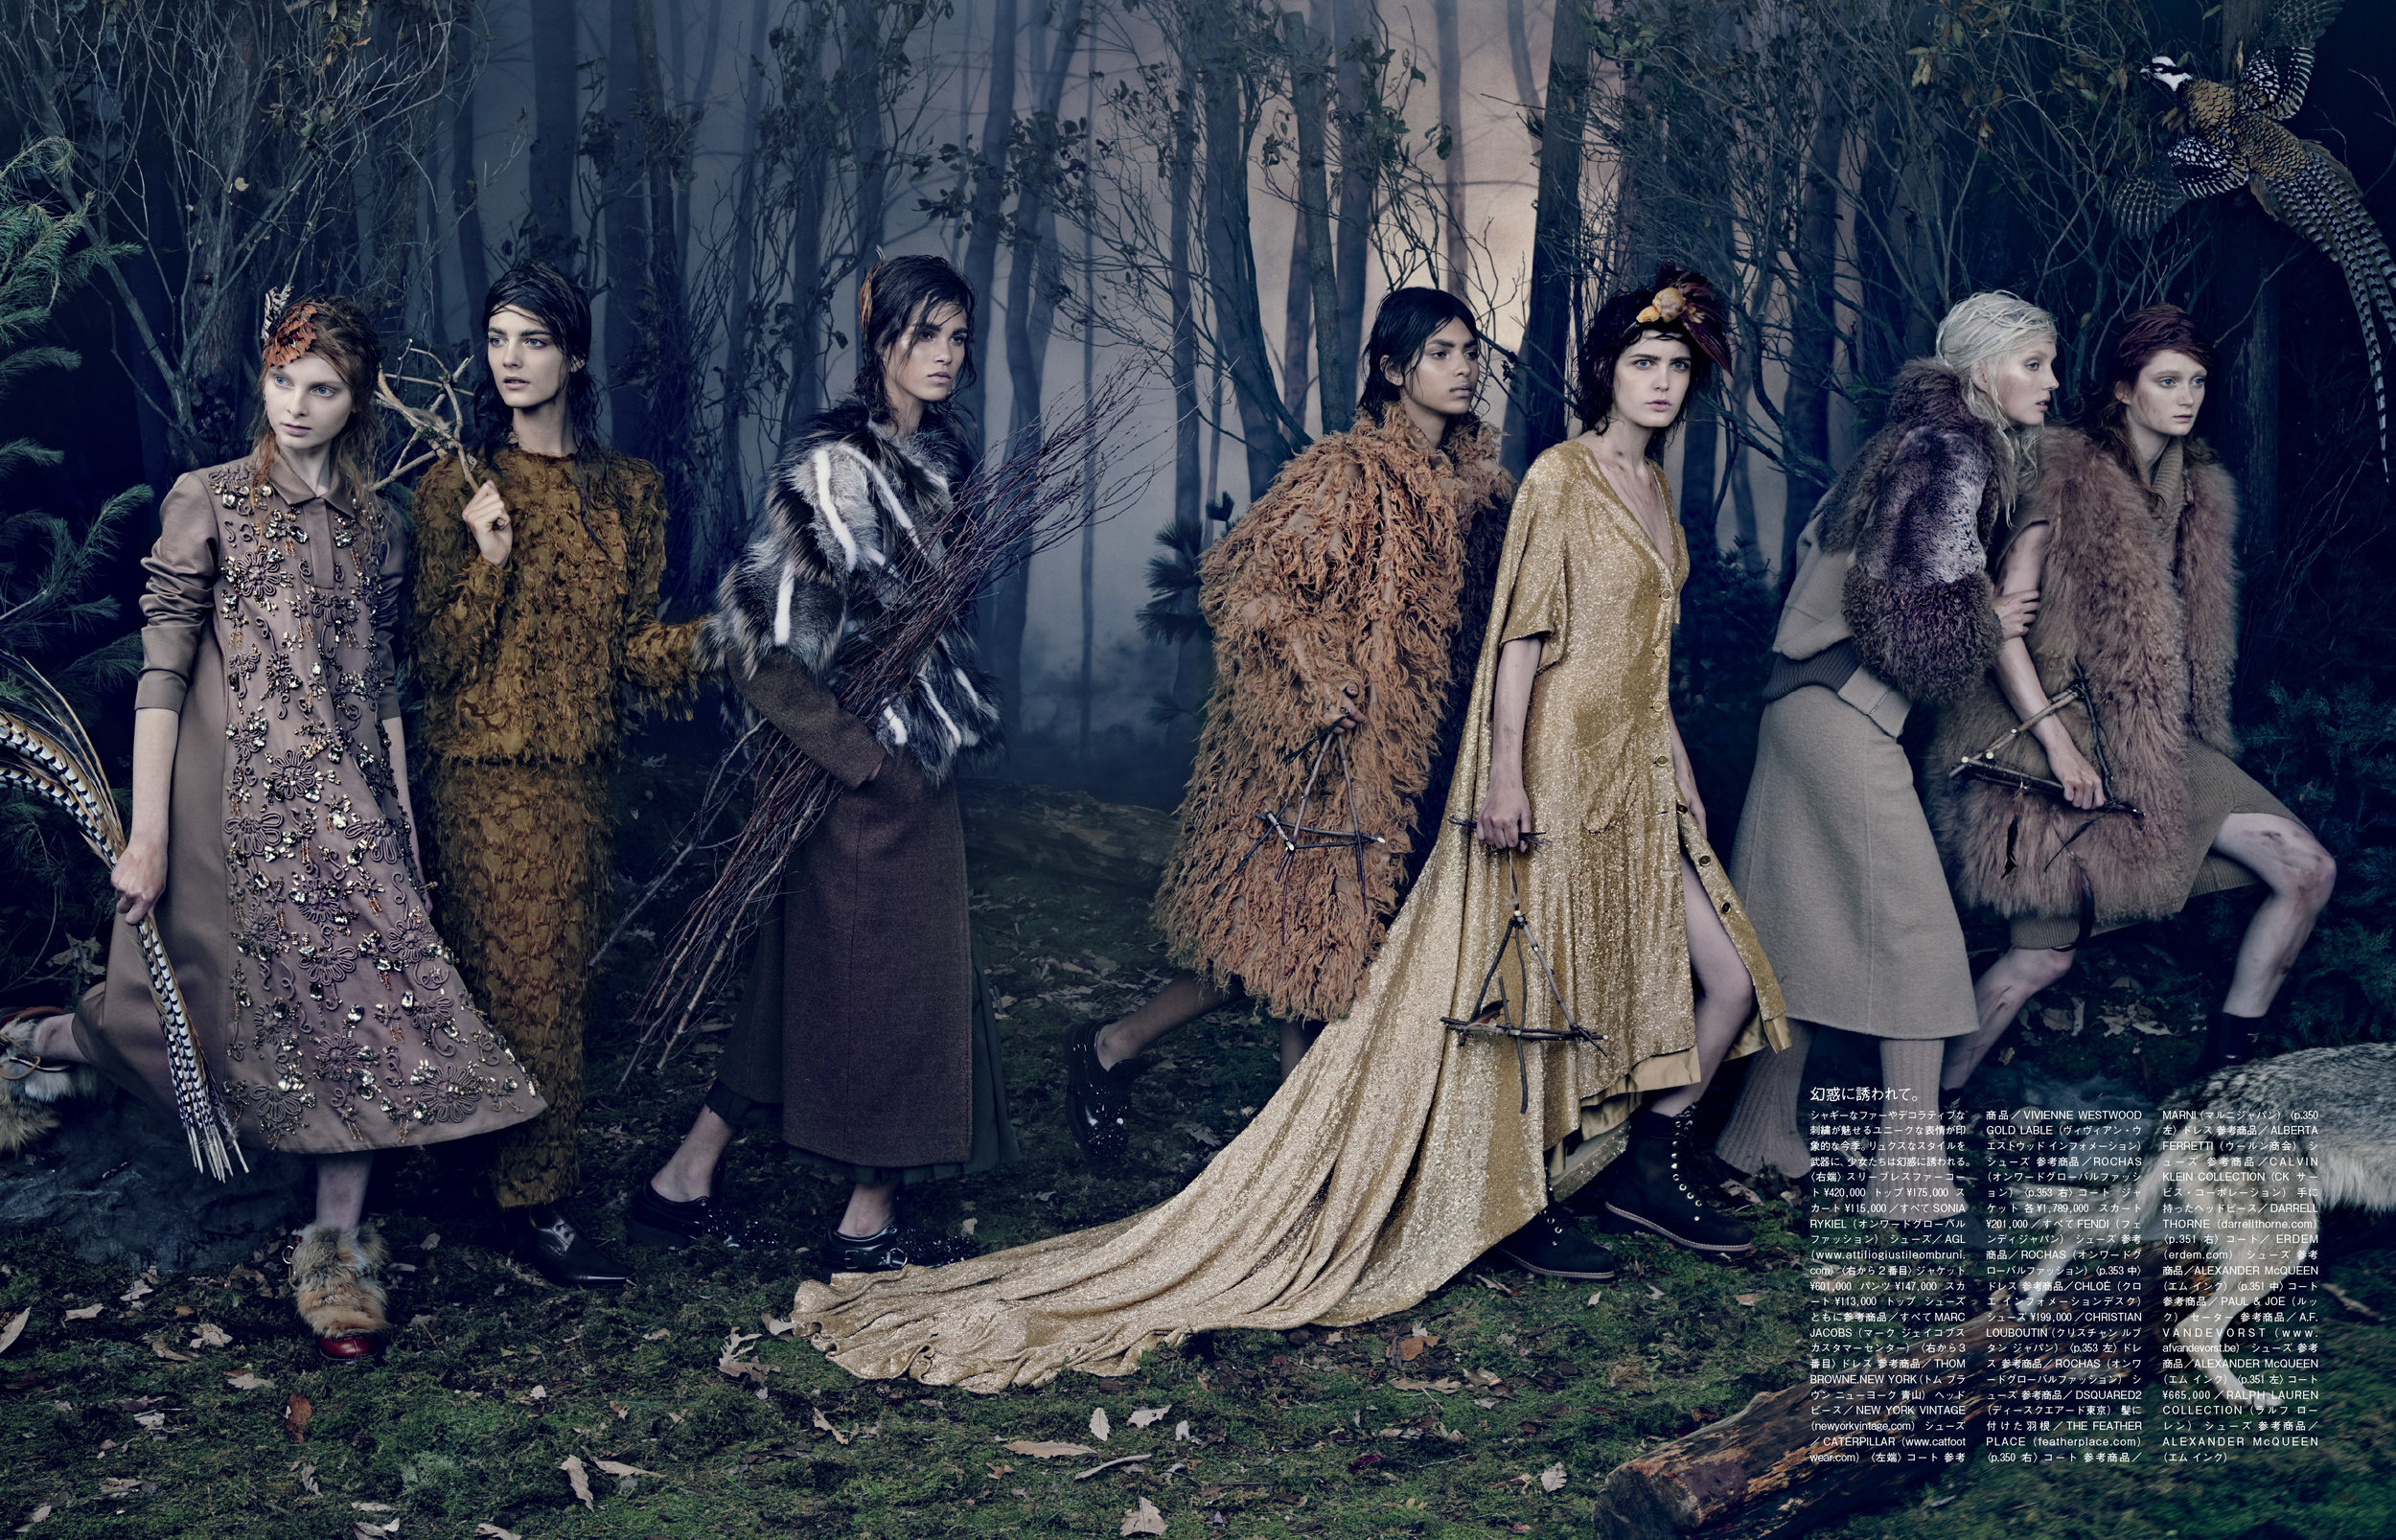 Giovanna-Battaglia-Into-The-Woods-Vogue-Japan-Emma-Summerton-03.jpg